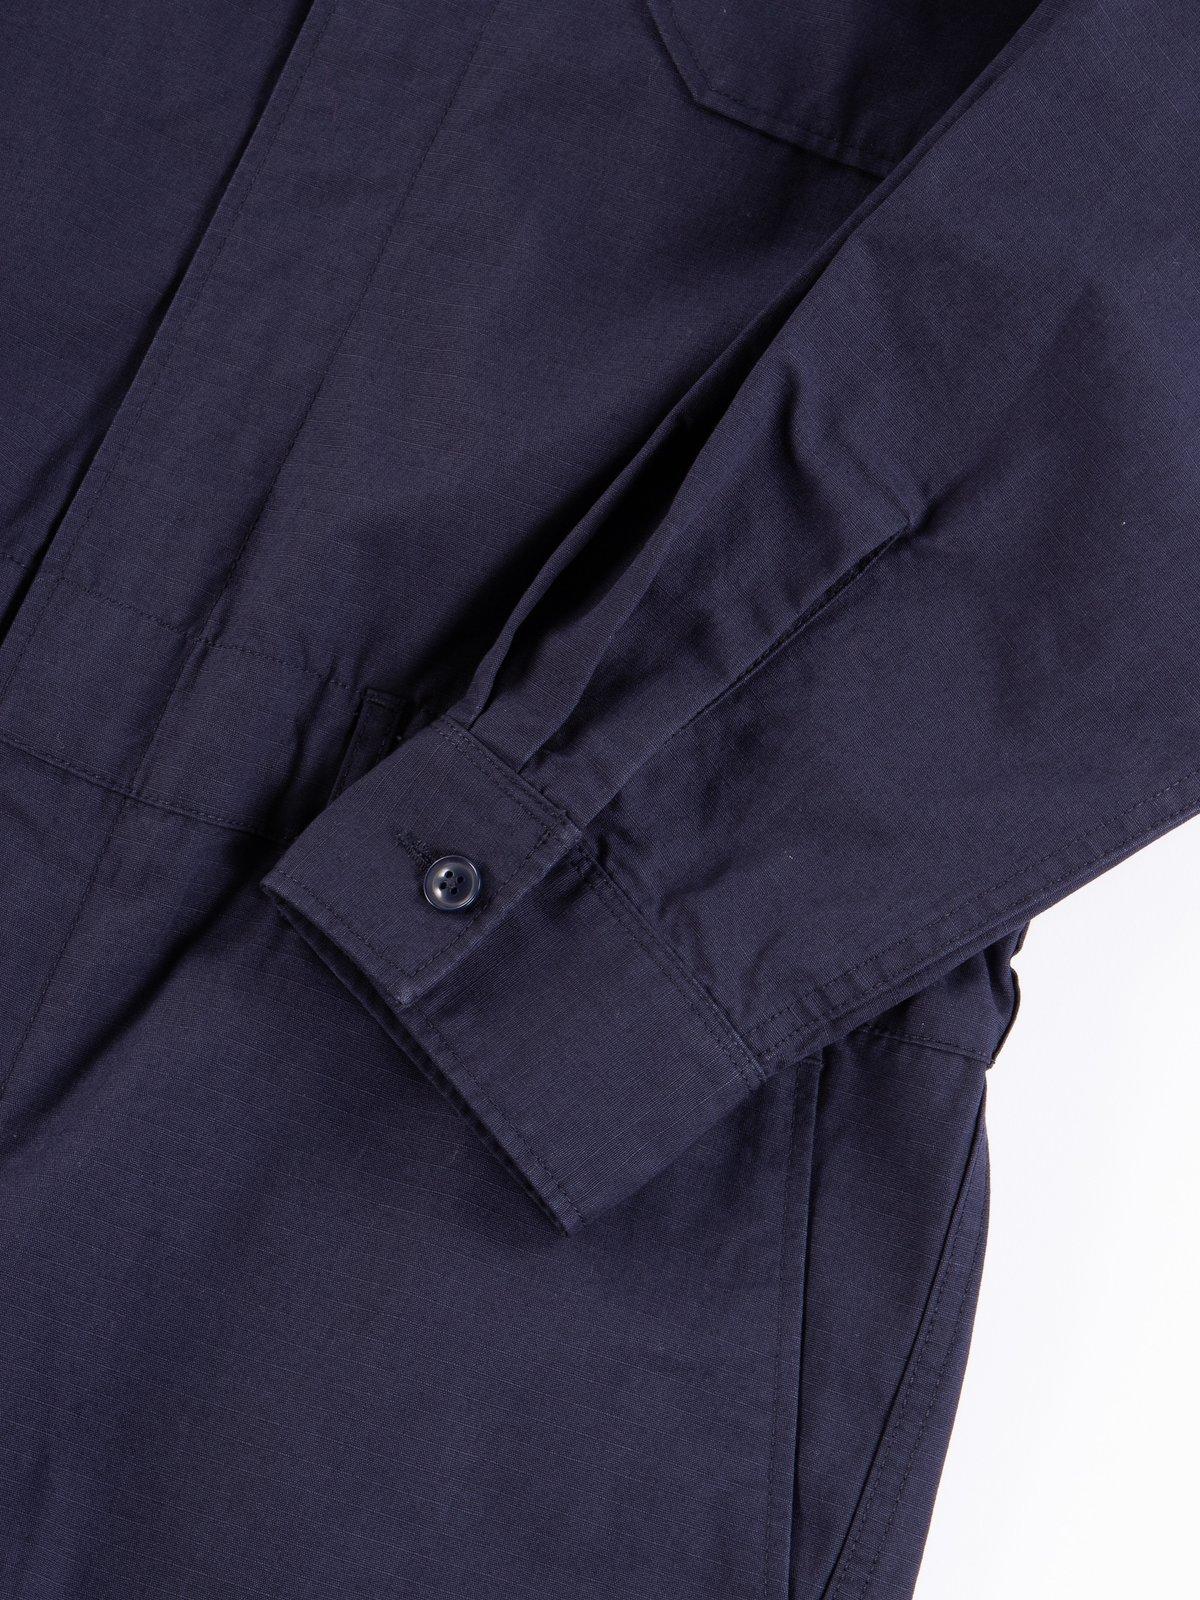 Dark Navy Cotton Ripstop Boiler Suit - Image 5